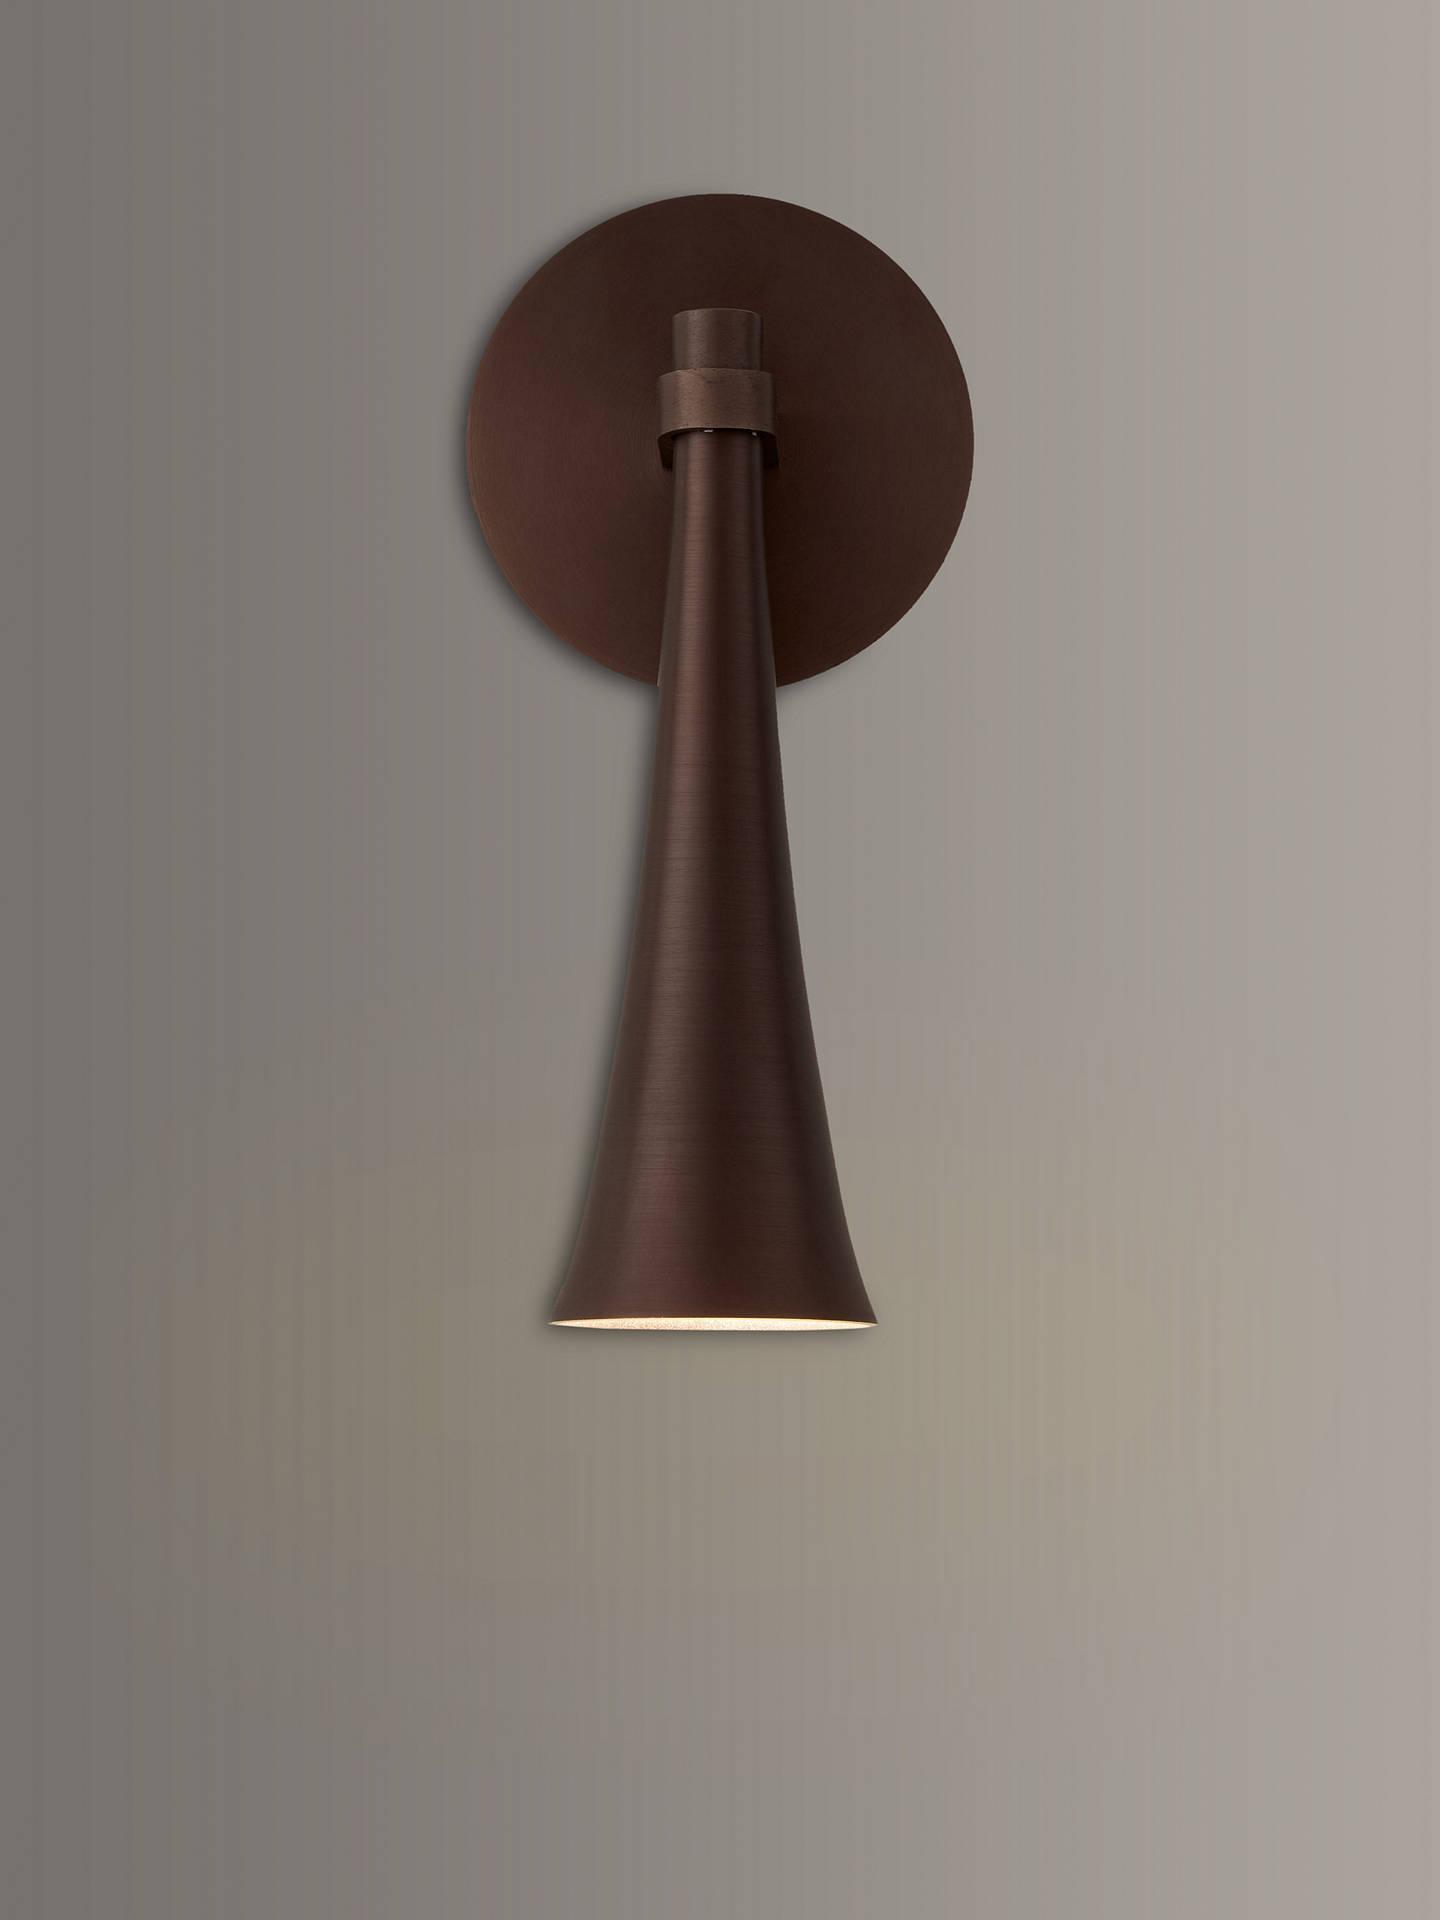 fc4fc686e110 Buy John Lewis & Partners Wyatt LED Cone Wall Light, Bronze Online at  johnlewis.